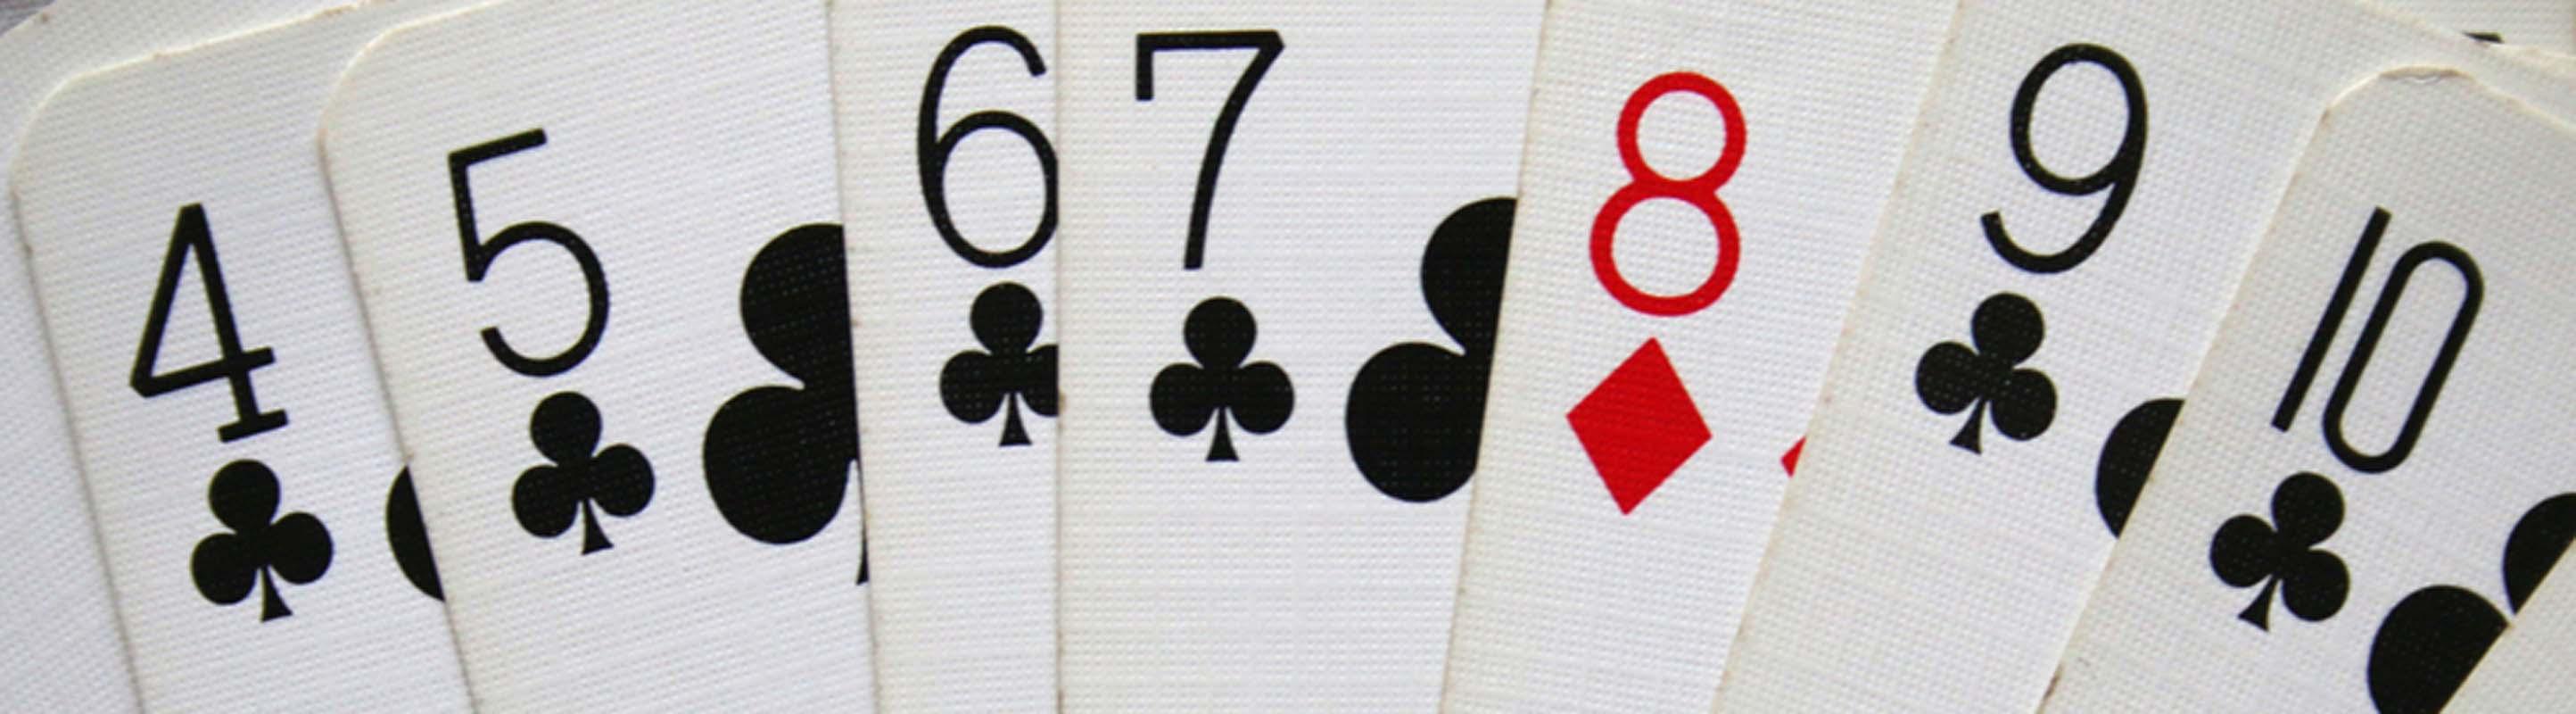 10.Cards-TonyTreglown--800.jpg